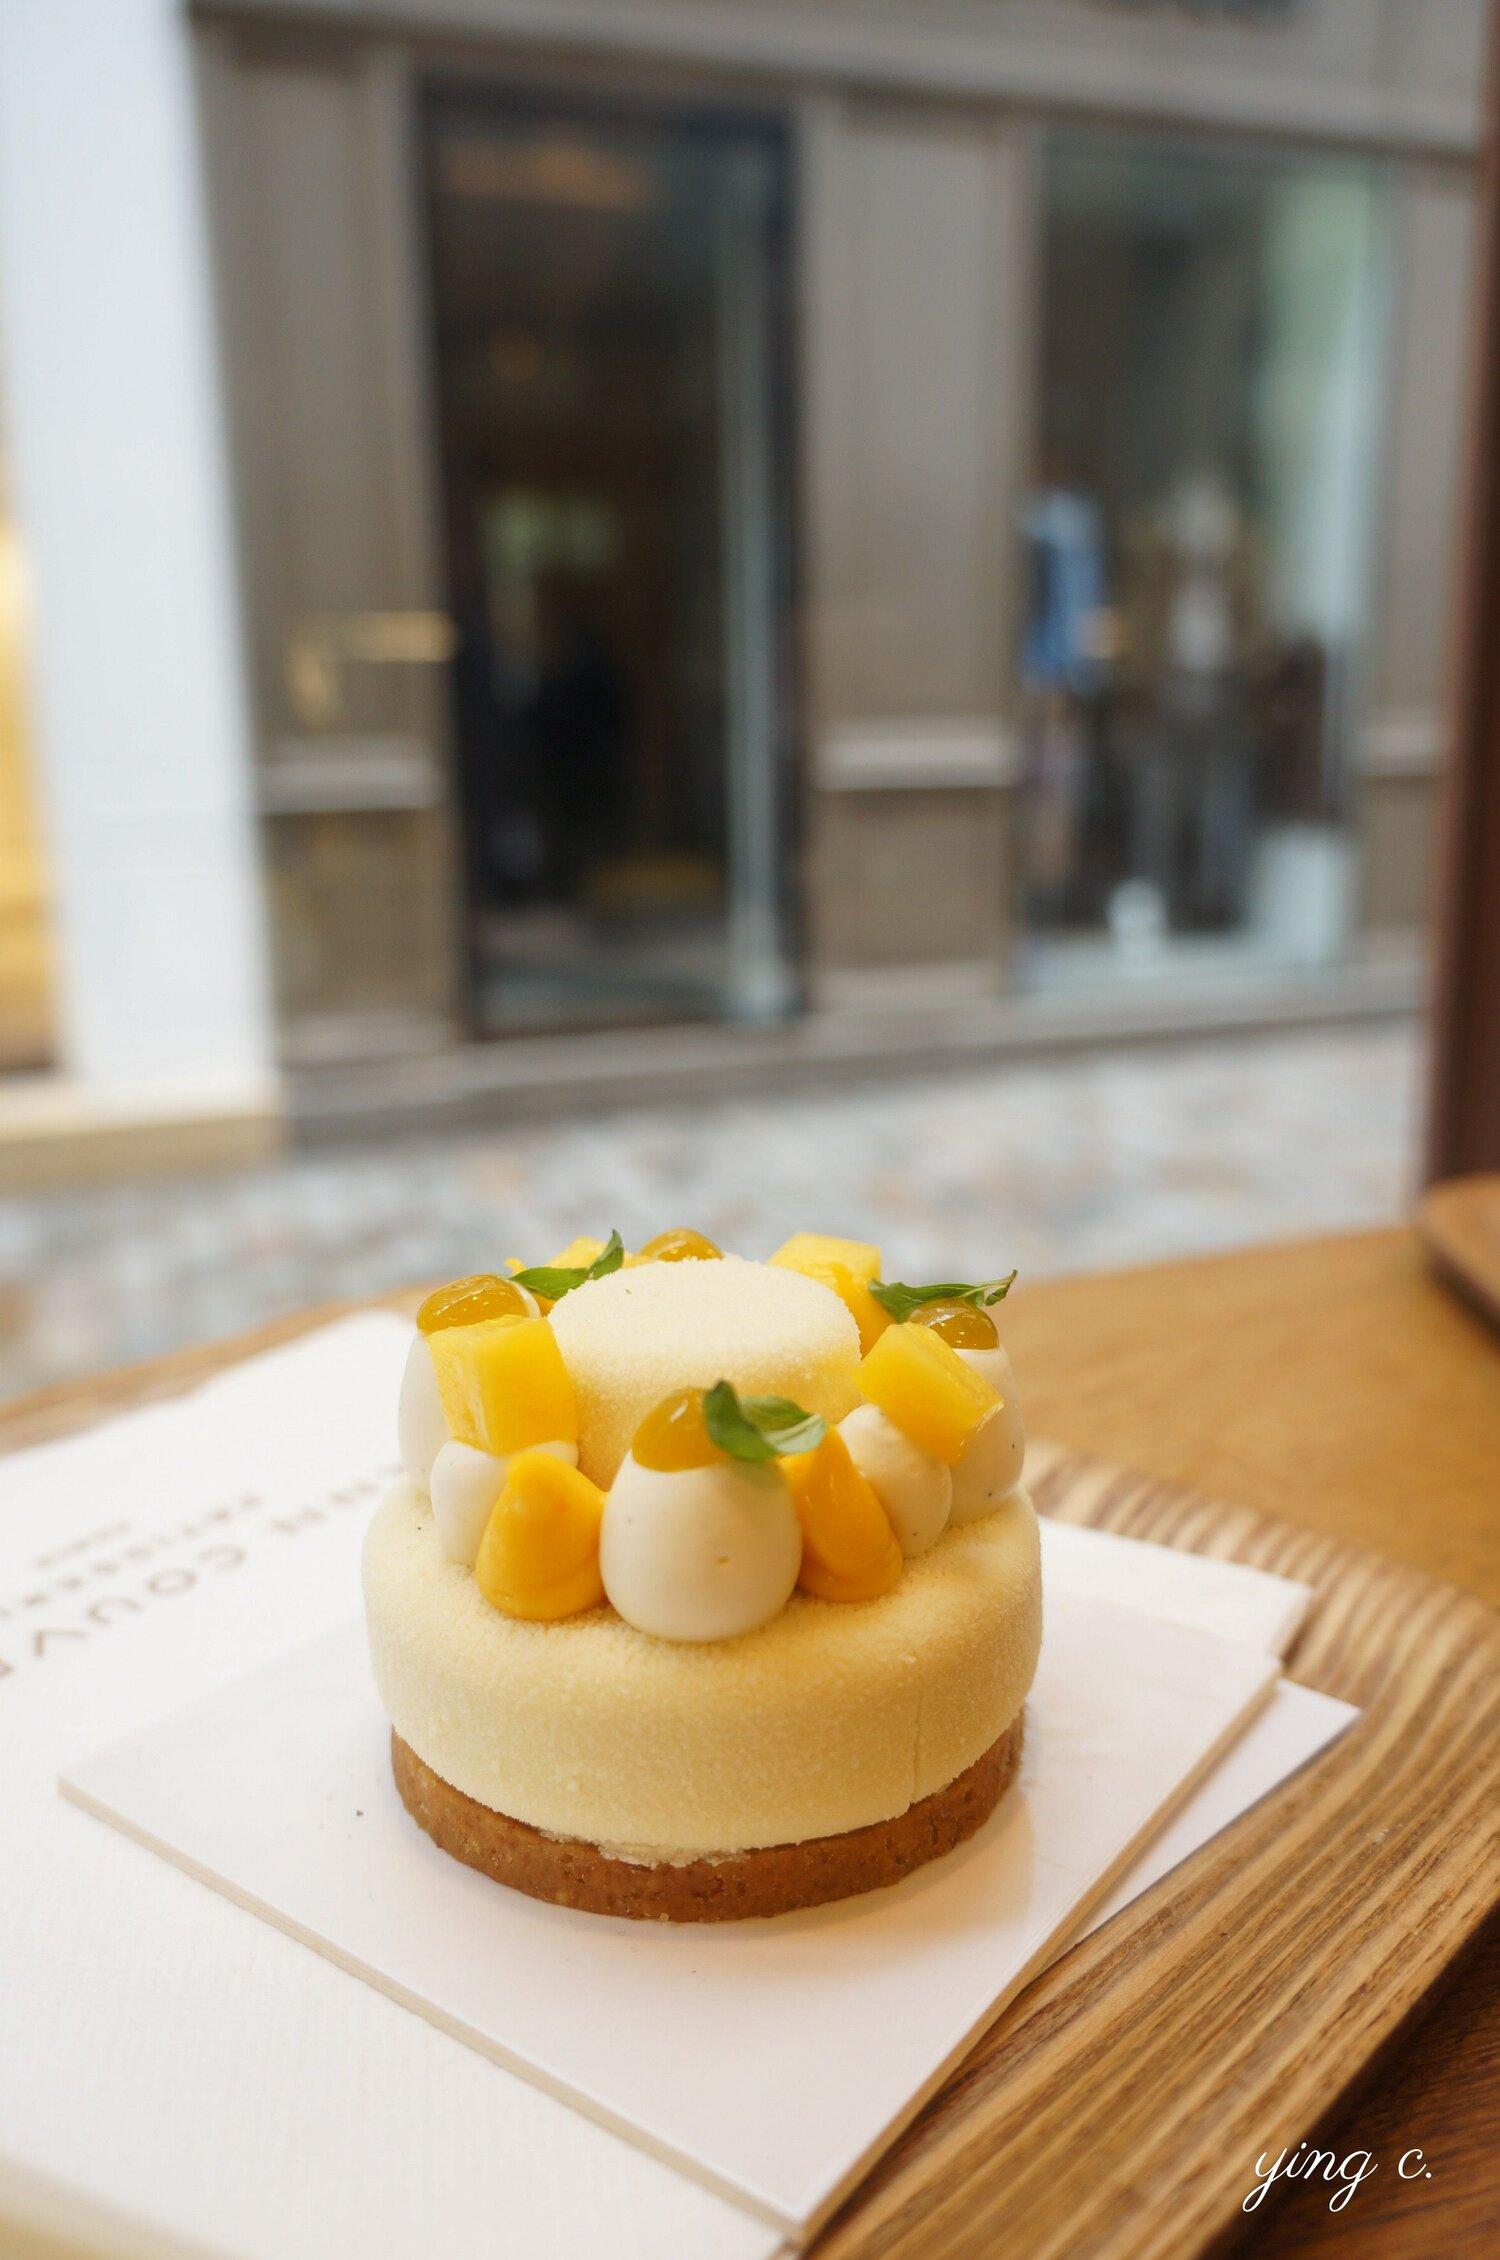 Yann Couvreur 主廚的「Cheesecake Mangue-Passion-Basilic-Jasmin」(芒果百香果羅勒茉莉花起司蛋糕),外觀是不是和你認知中的美式起司蛋糕完全不一樣呢?這就是典型的以法式甜點手法重新詮釋異國甜點的一個例子。  本蛋糕的結構:sablé(沙布列酥餅)、mousse cheesecake au jasmin(起司蛋糕茉莉花慕斯)、agar mangue – passion – basilic(芒果百香果羅勒果凍)、 crème brulée mangue-passion(芒果百香果焦糖布丁)、crème cheesecake classique(經典起司蛋糕奶餡)、mangue fraiche(新鮮芒果),其實是一個如假包換的 entremets(法式蛋糕):包含 麵糰 (沙布列酥餅)、 奶餡 (慕斯、焦糖布丁、起司蛋糕奶餡,另加果凍增添變化)、 淋面 (本例中是以用噴槍噴上絨面)、 裝飾 (新鮮芒果、羅勒葉、果醬等)。